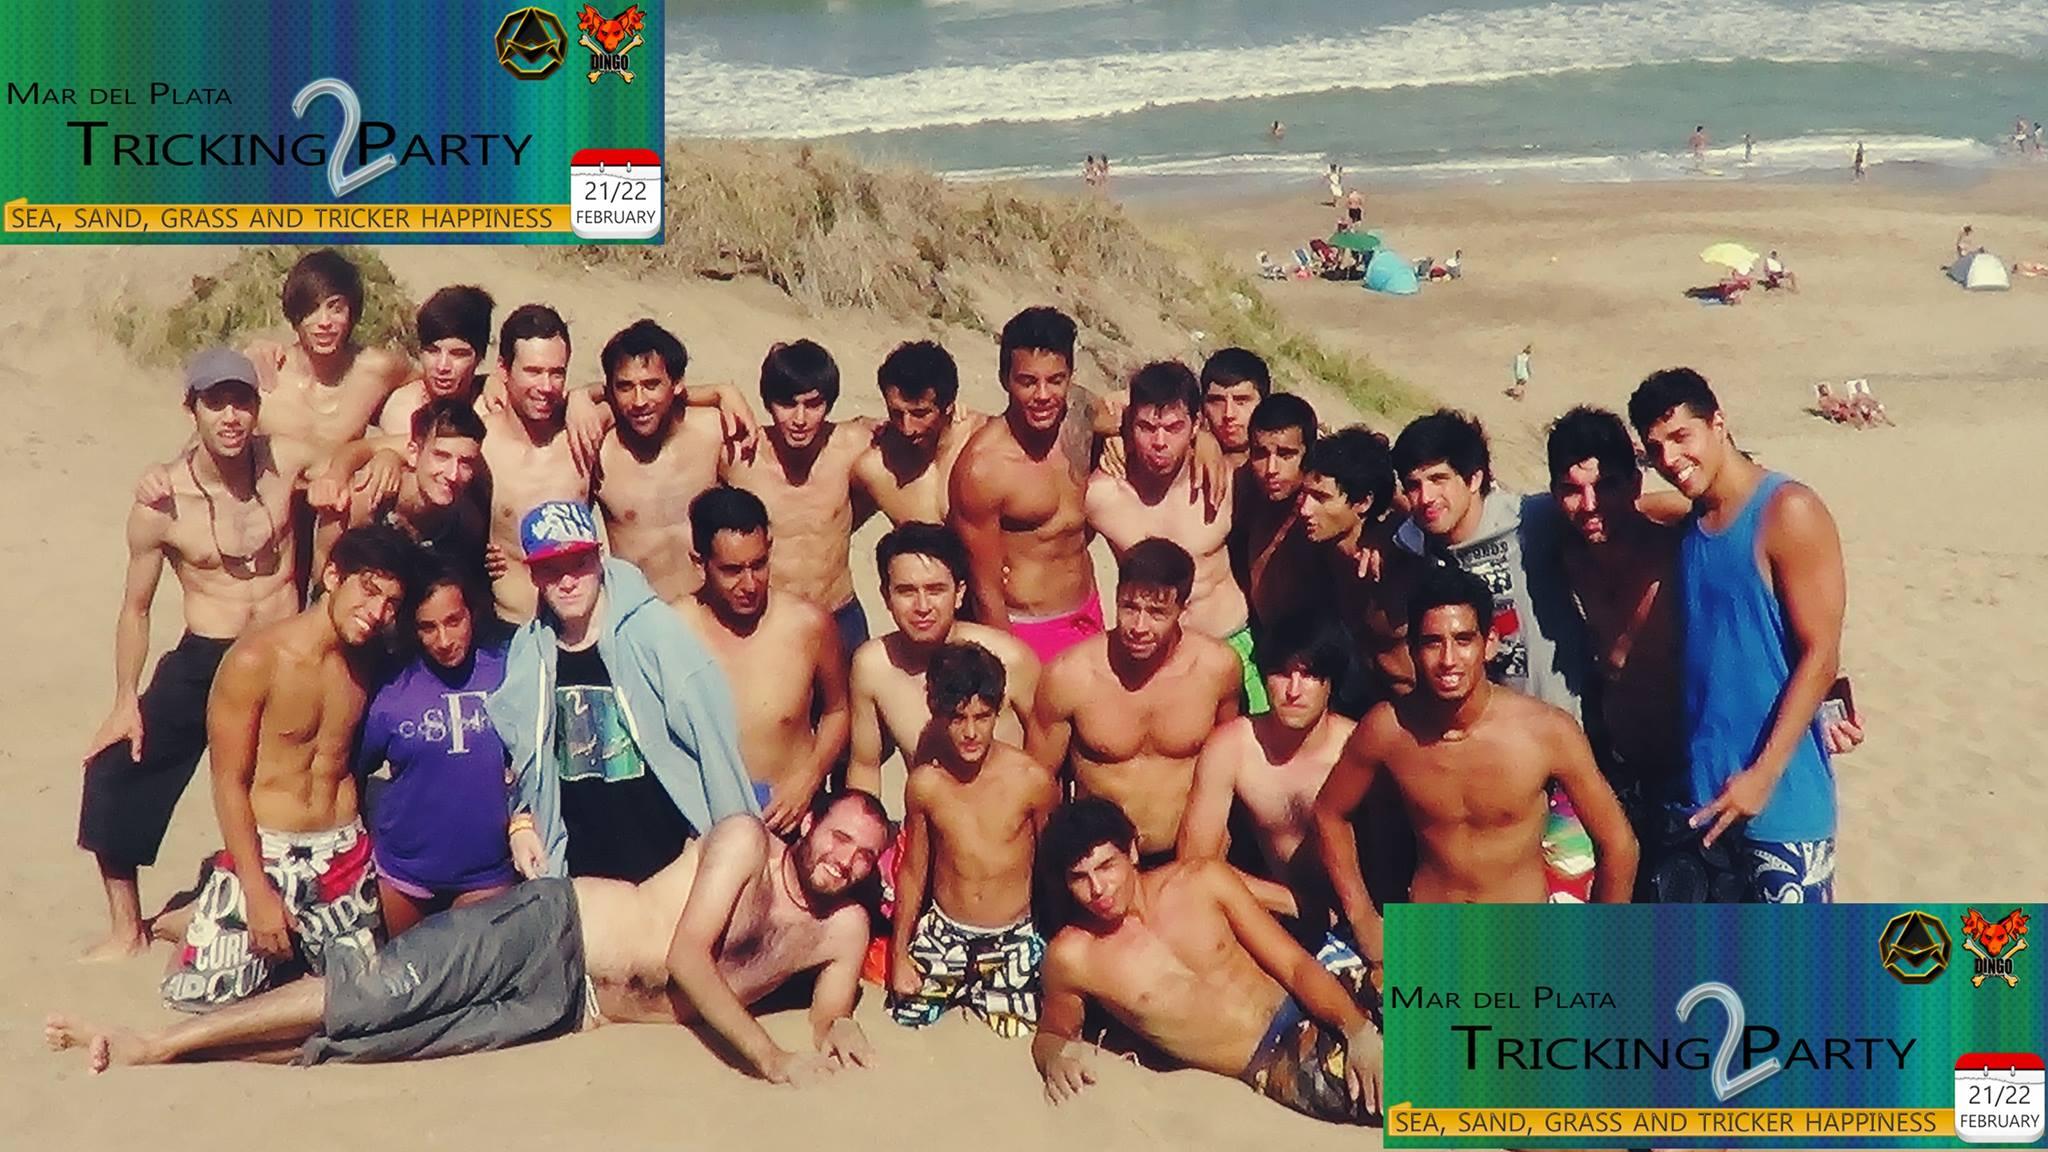 Tricking Party 2 (MDQ Gathering Mar del Plata 2015 ...